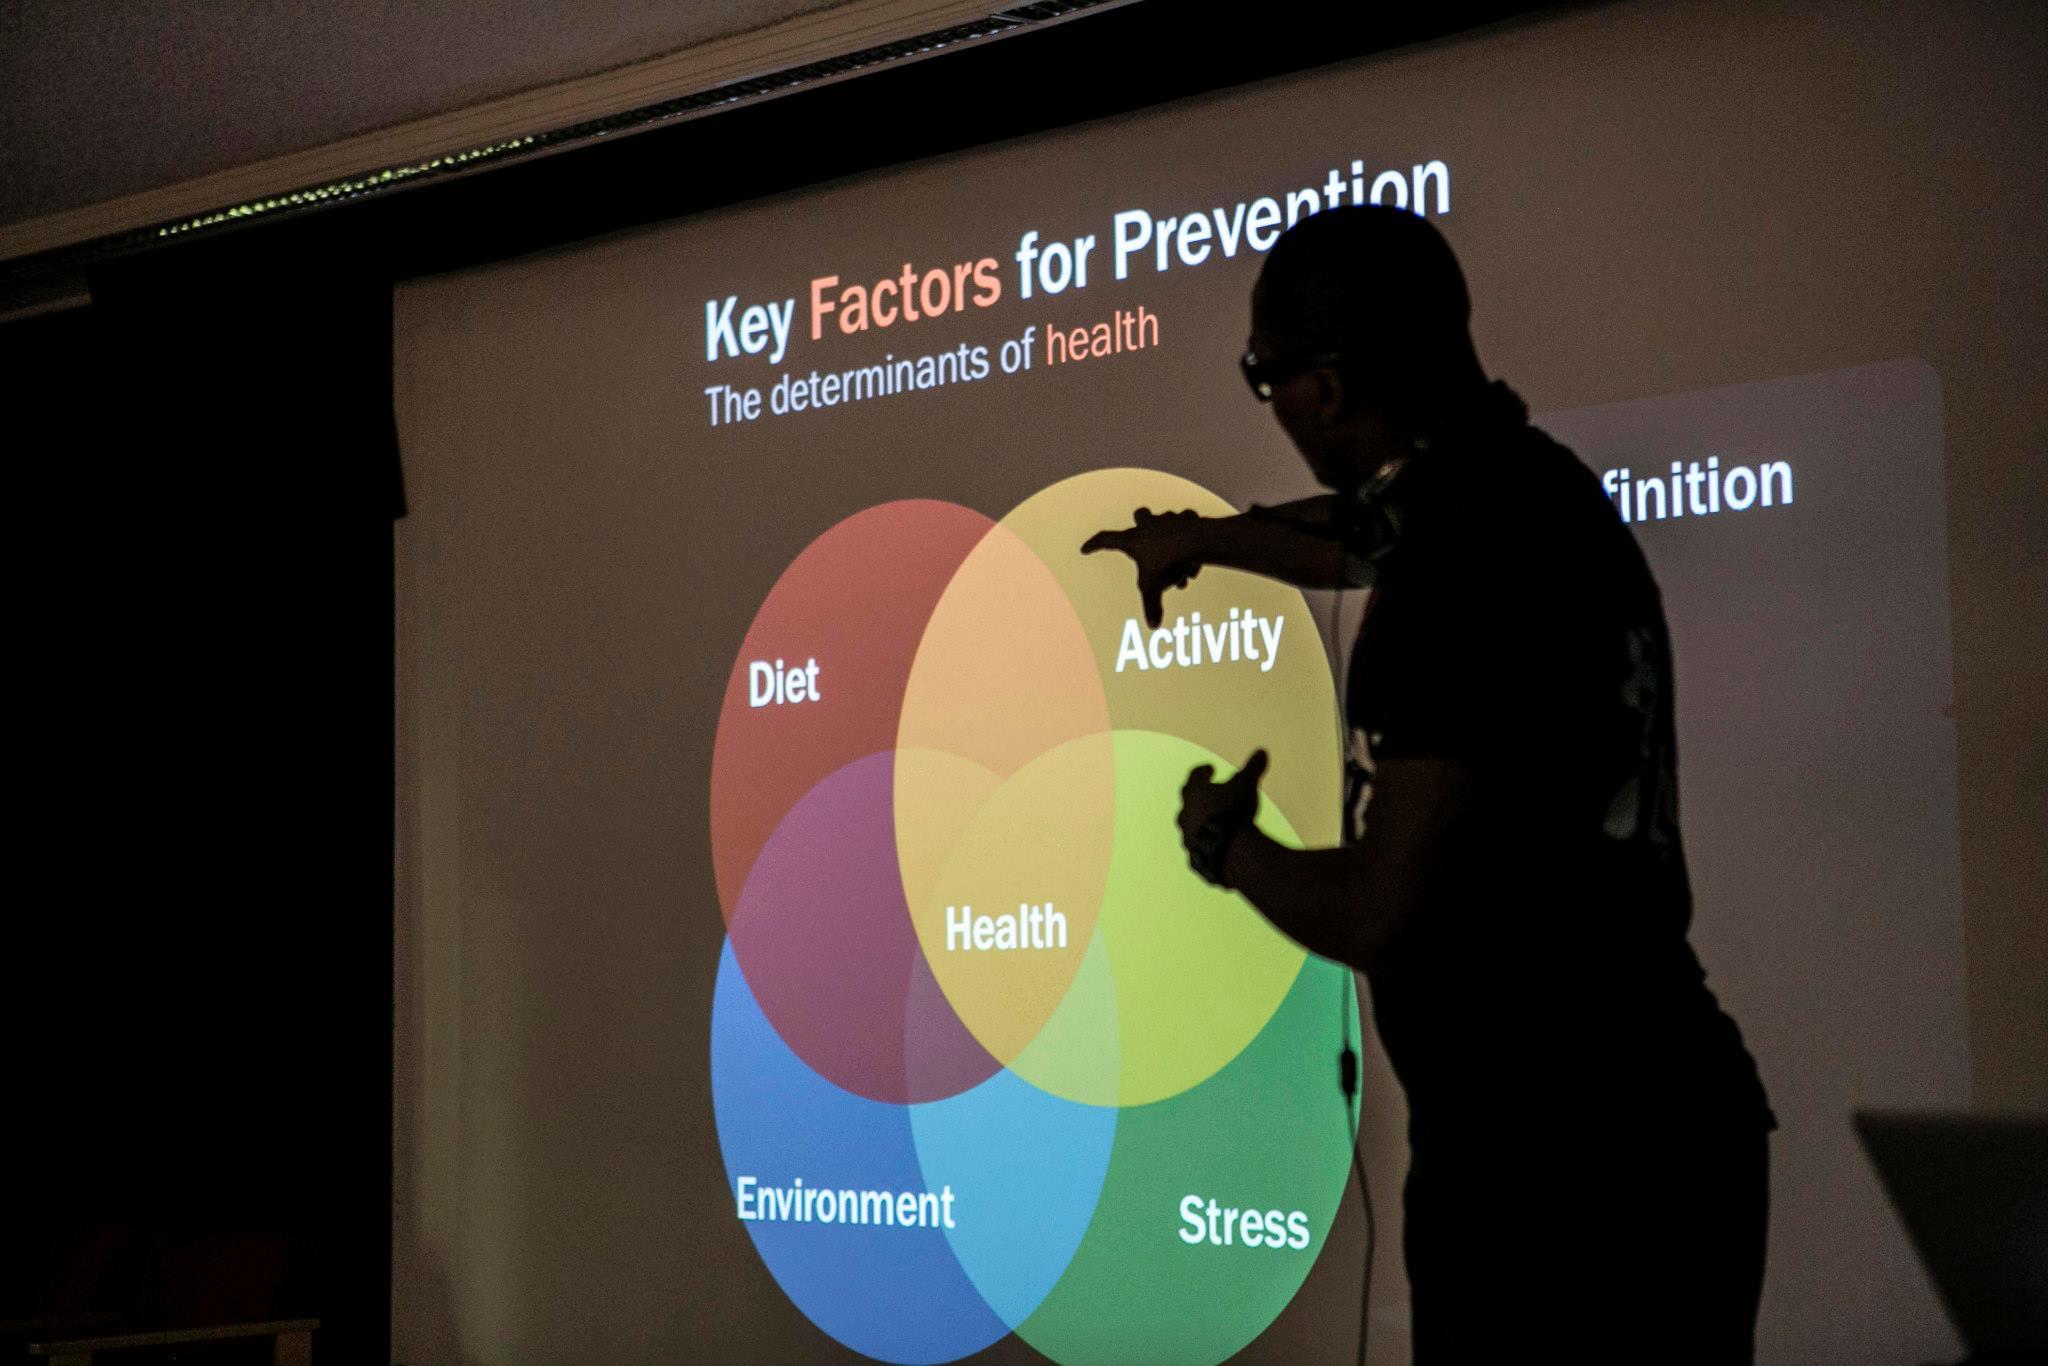 Factors for Health